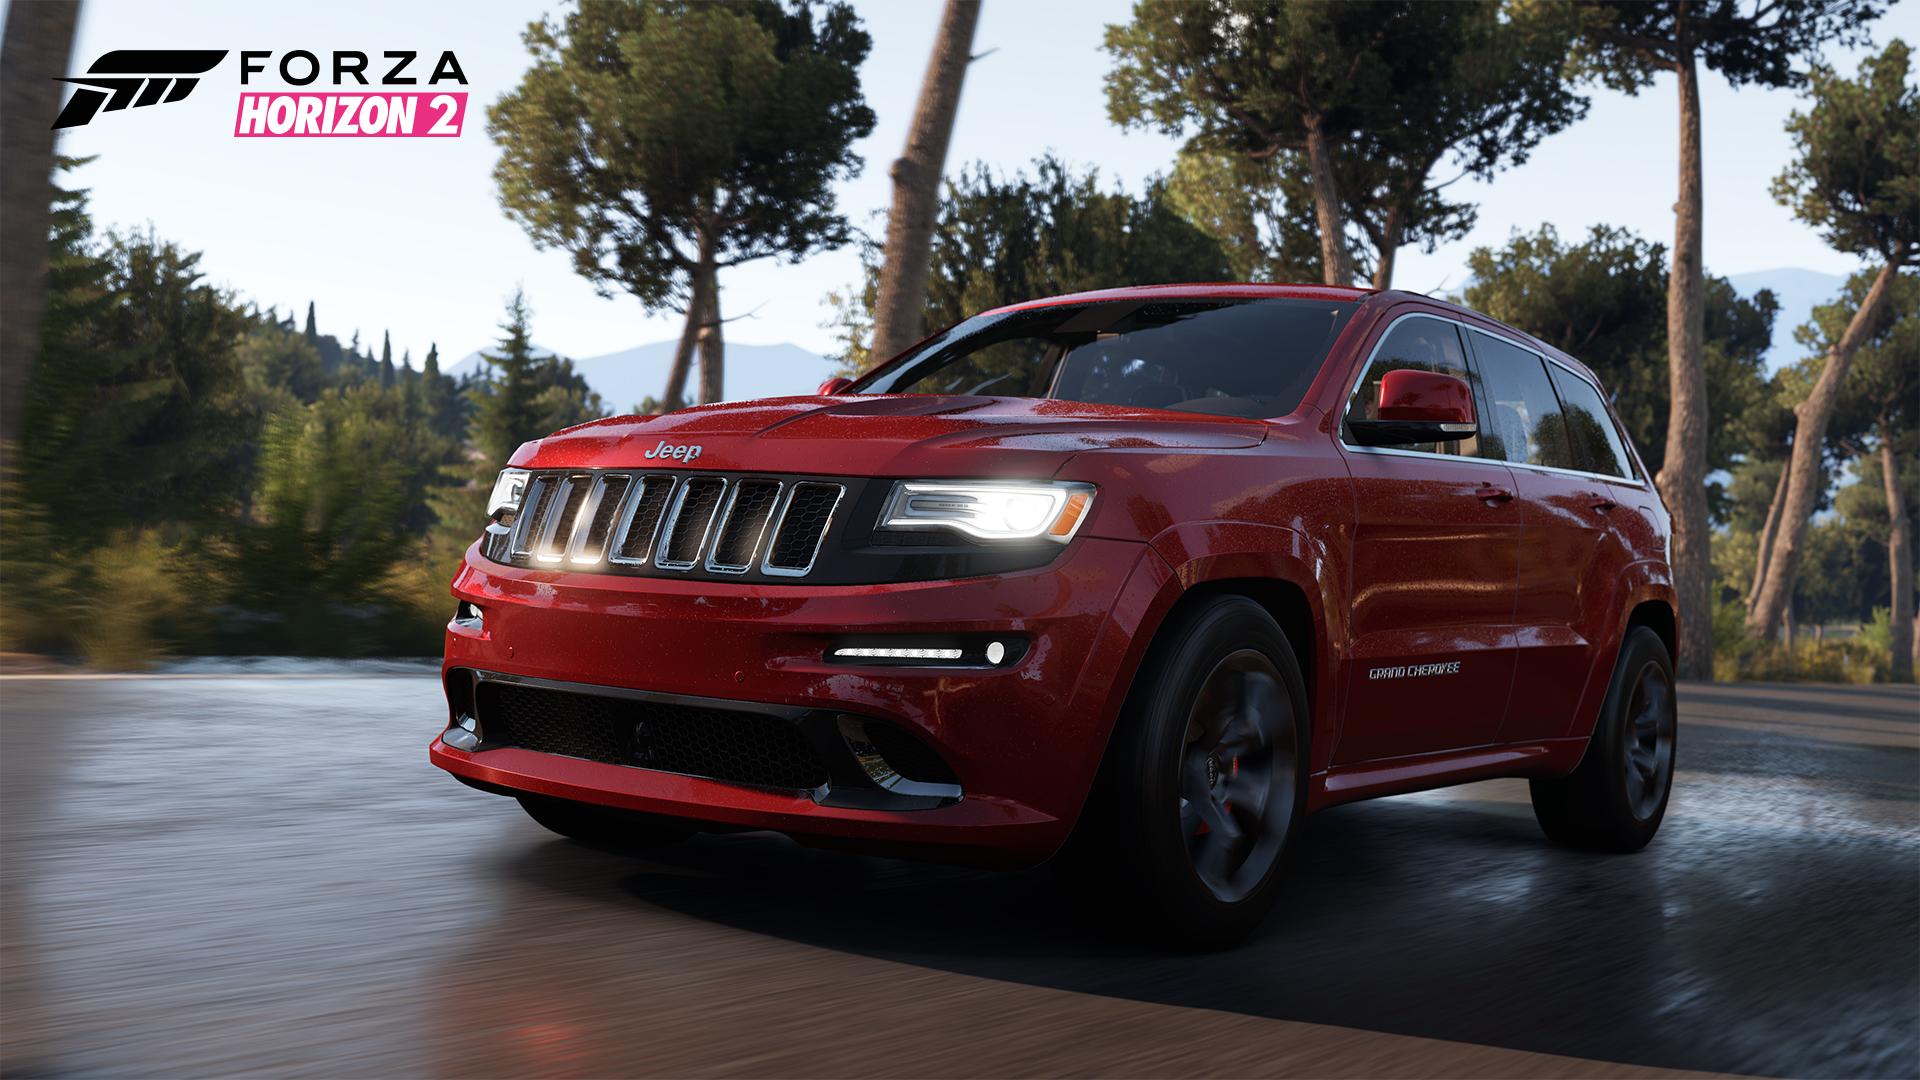 Jeep Grand Cherokee SRT Forza Motorsport Wiki